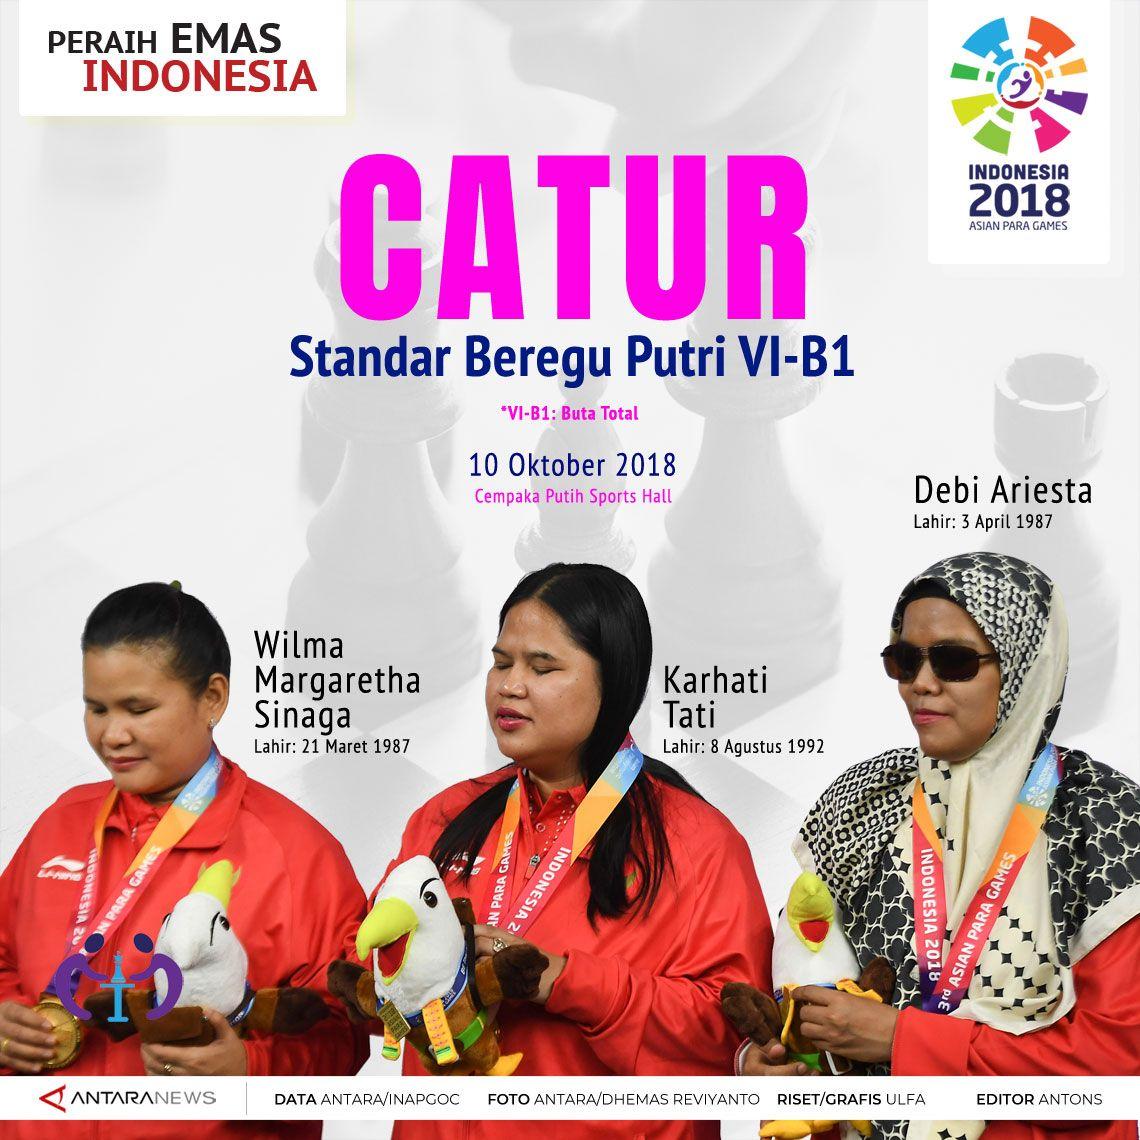 Peraih Emas Indonesia: Catur Beregu Puteri